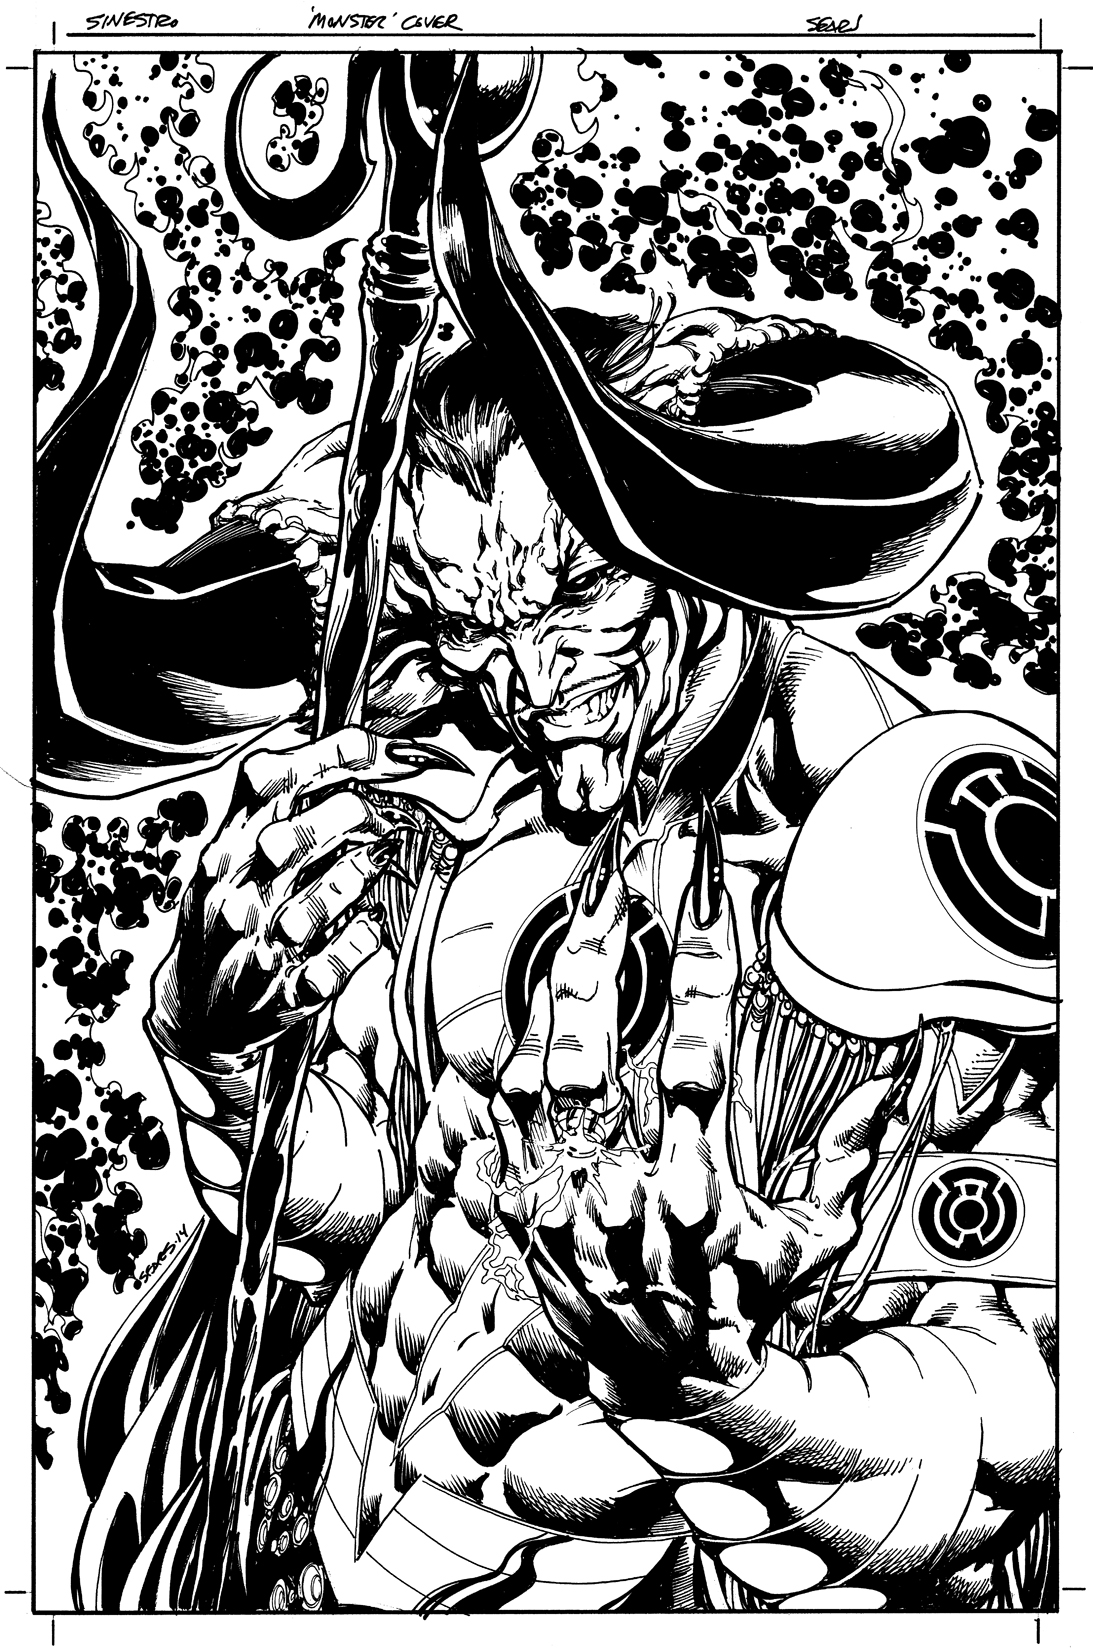 Sinestro_MonsterCover_Inks_Sears_150dpi.